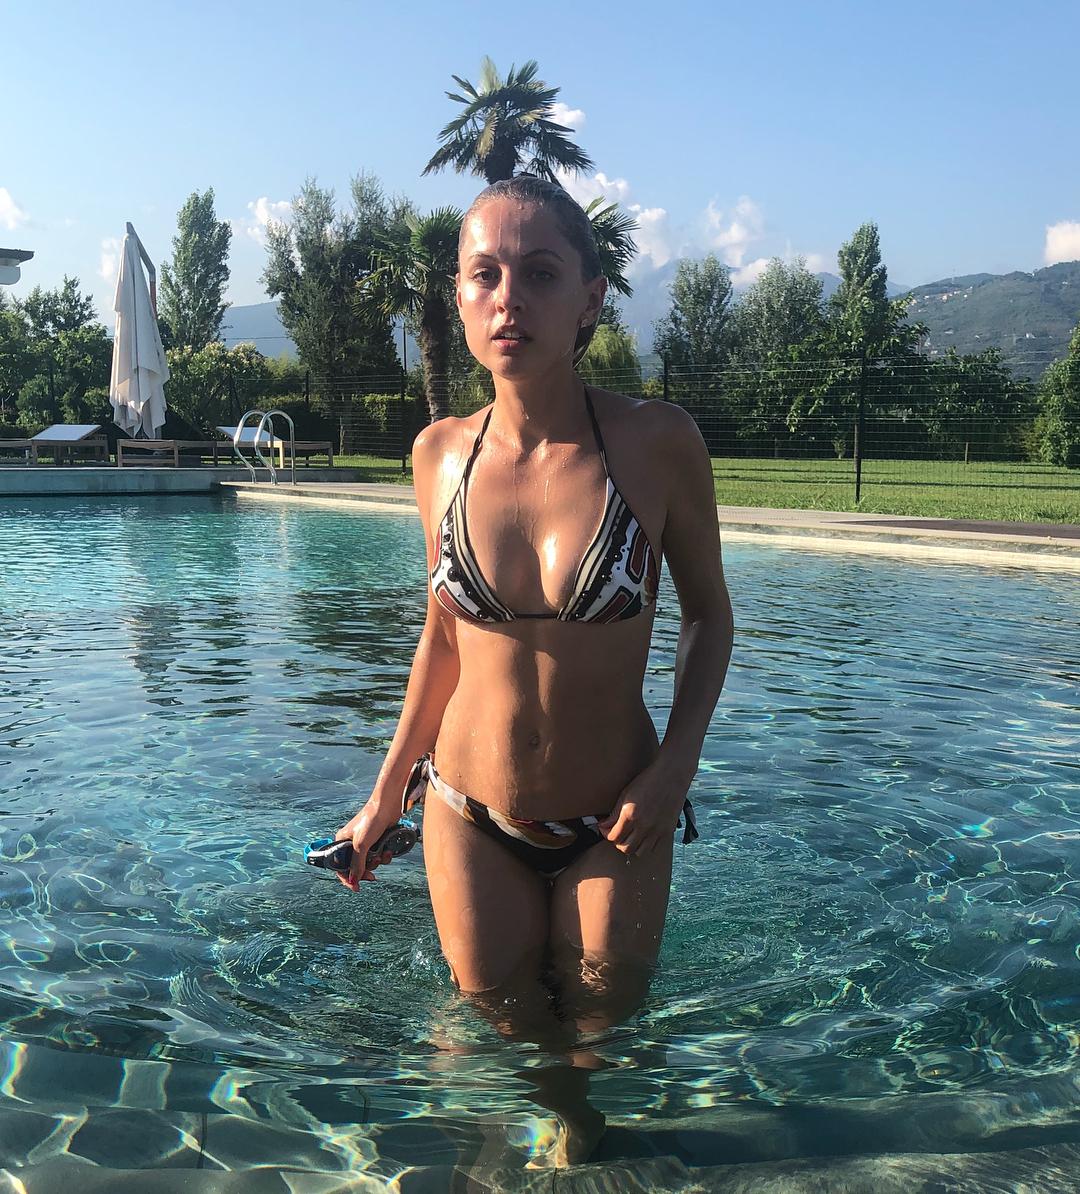 Янина Студилина: Какая фотка лучше 1 или 2?  #сложностивыбора #девочкитакиедевочки #bikinilife  #parahworld #swimwear  #italy  #италия #тоскана